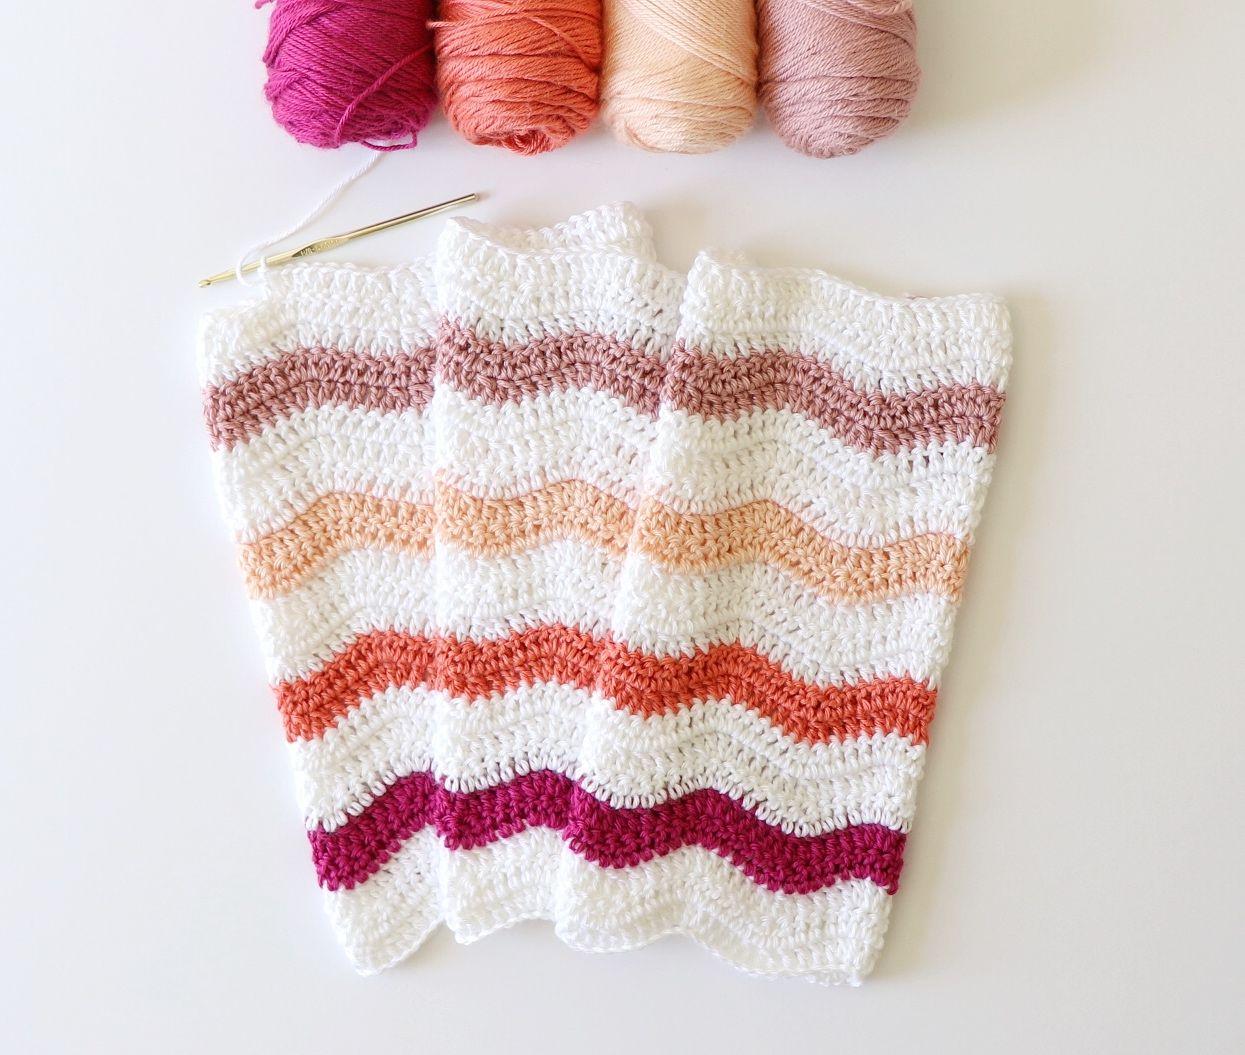 Crochet Jewel Tones Ripple Blanket | Lapghan | Pinterest